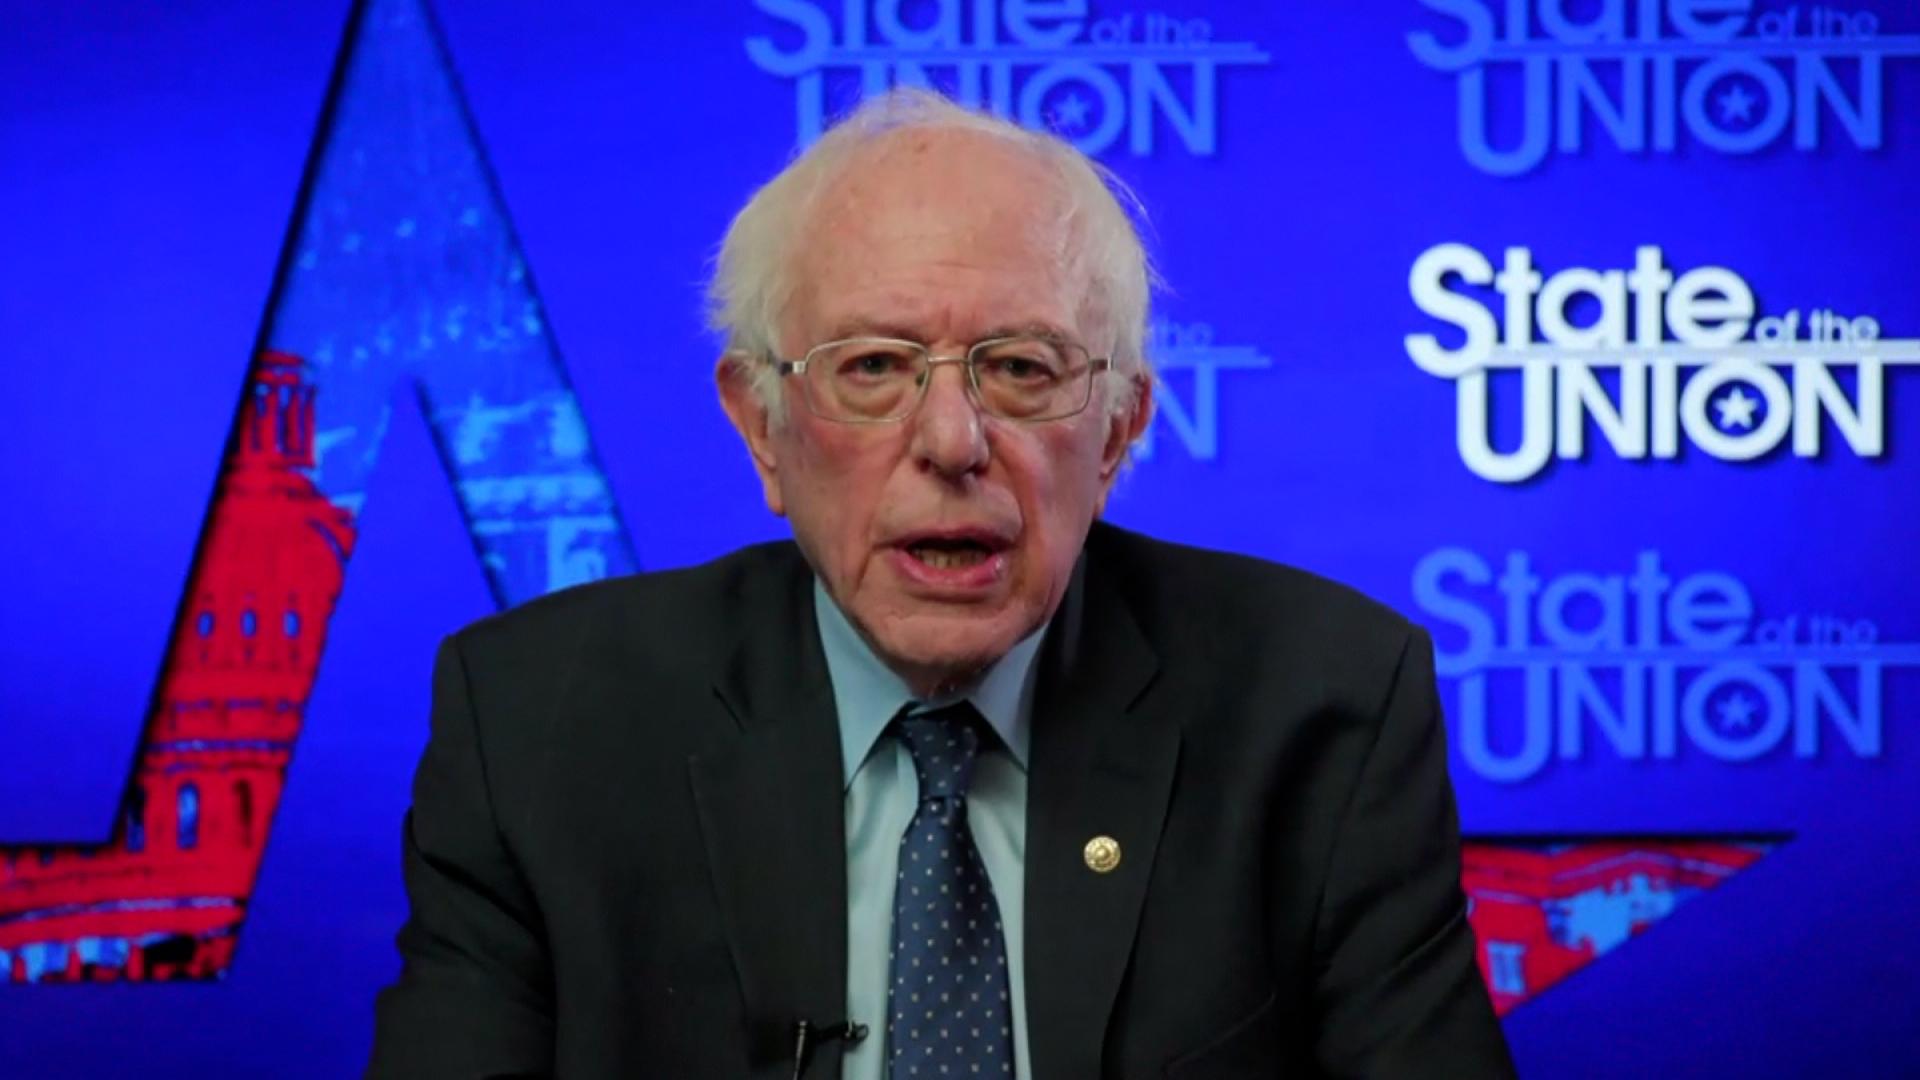 Sen. Bernie Sanders on February 7.